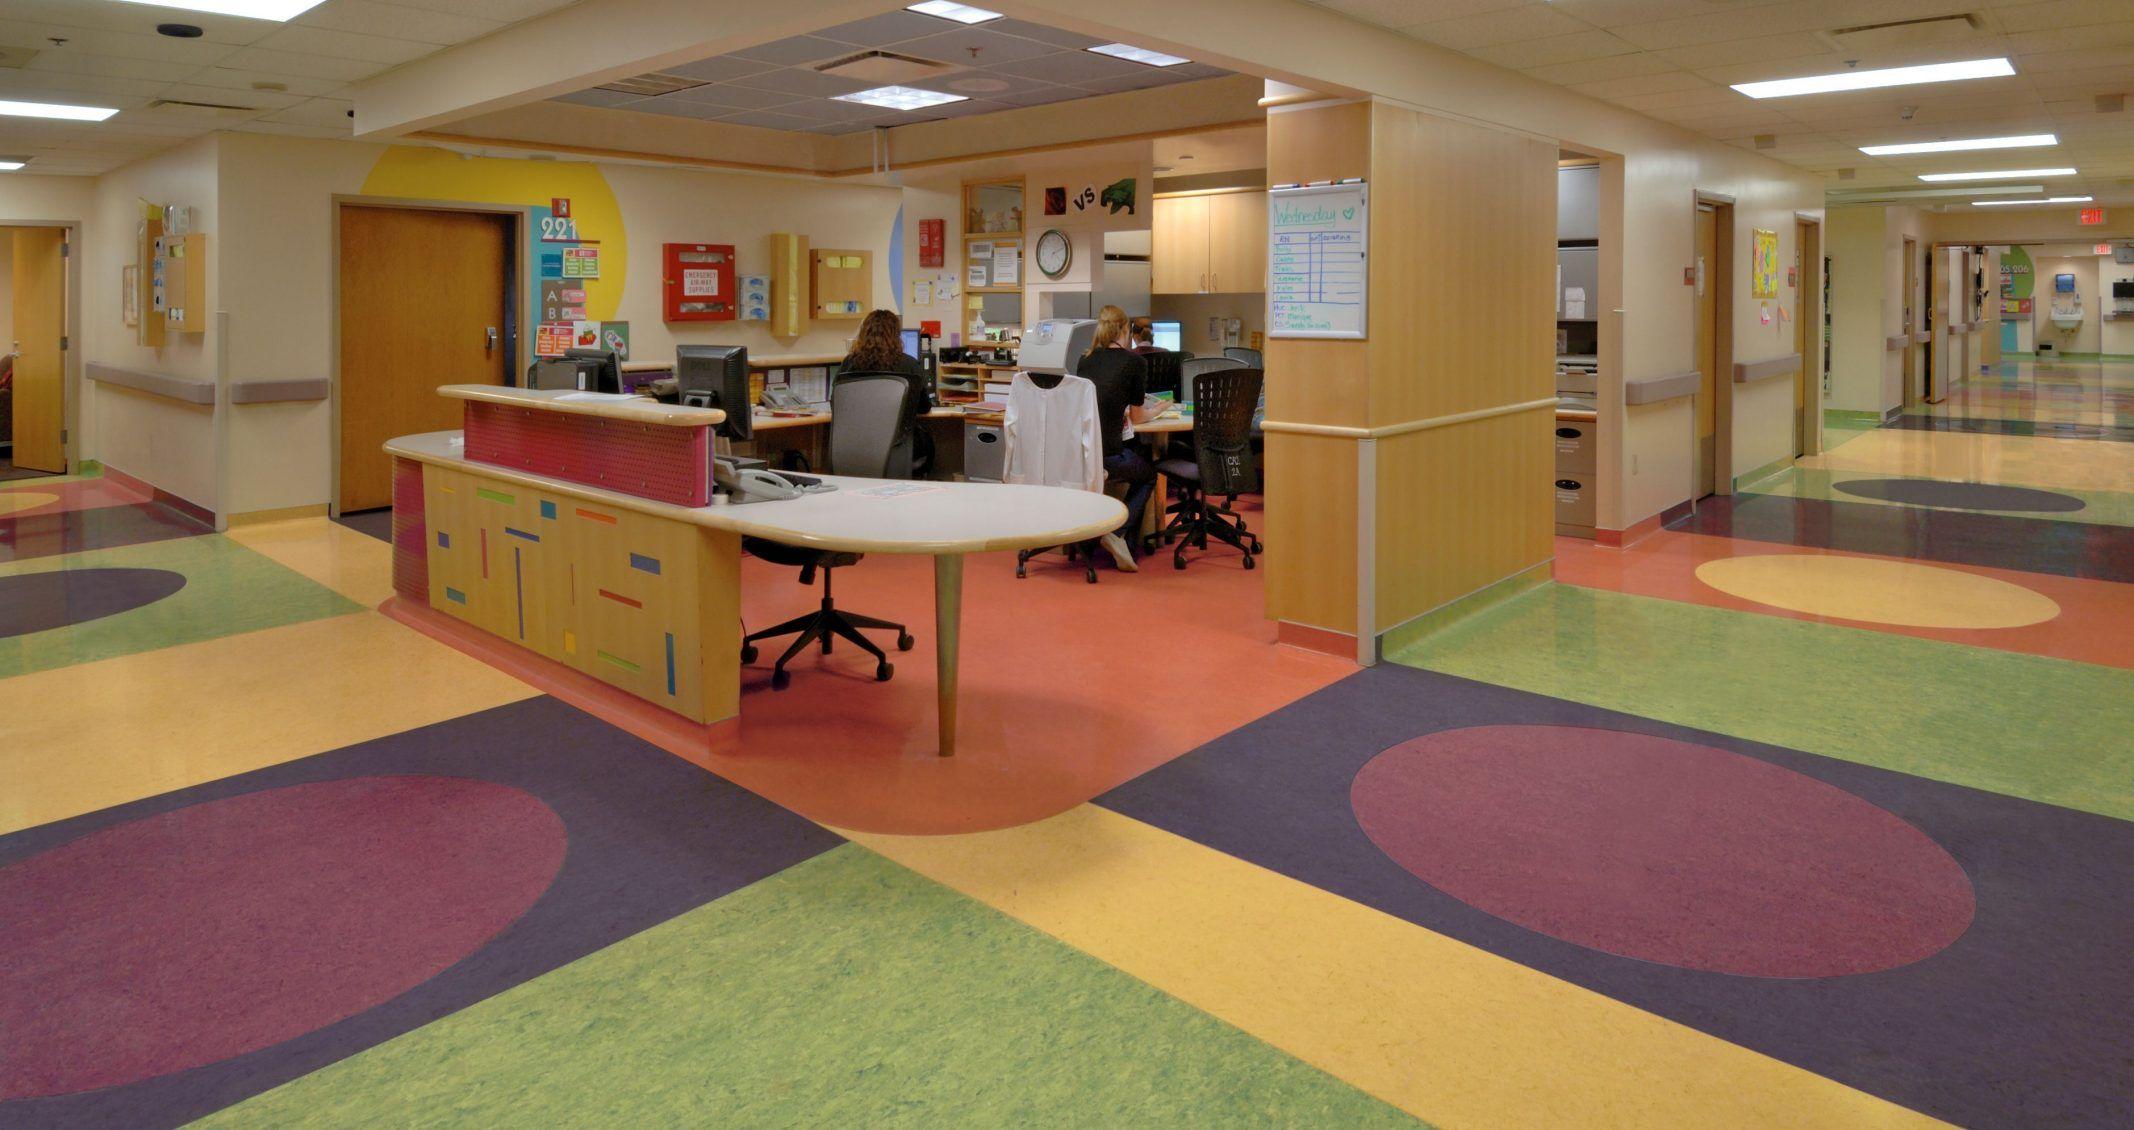 Phoenix Children's Hospital Project Photo Gallery